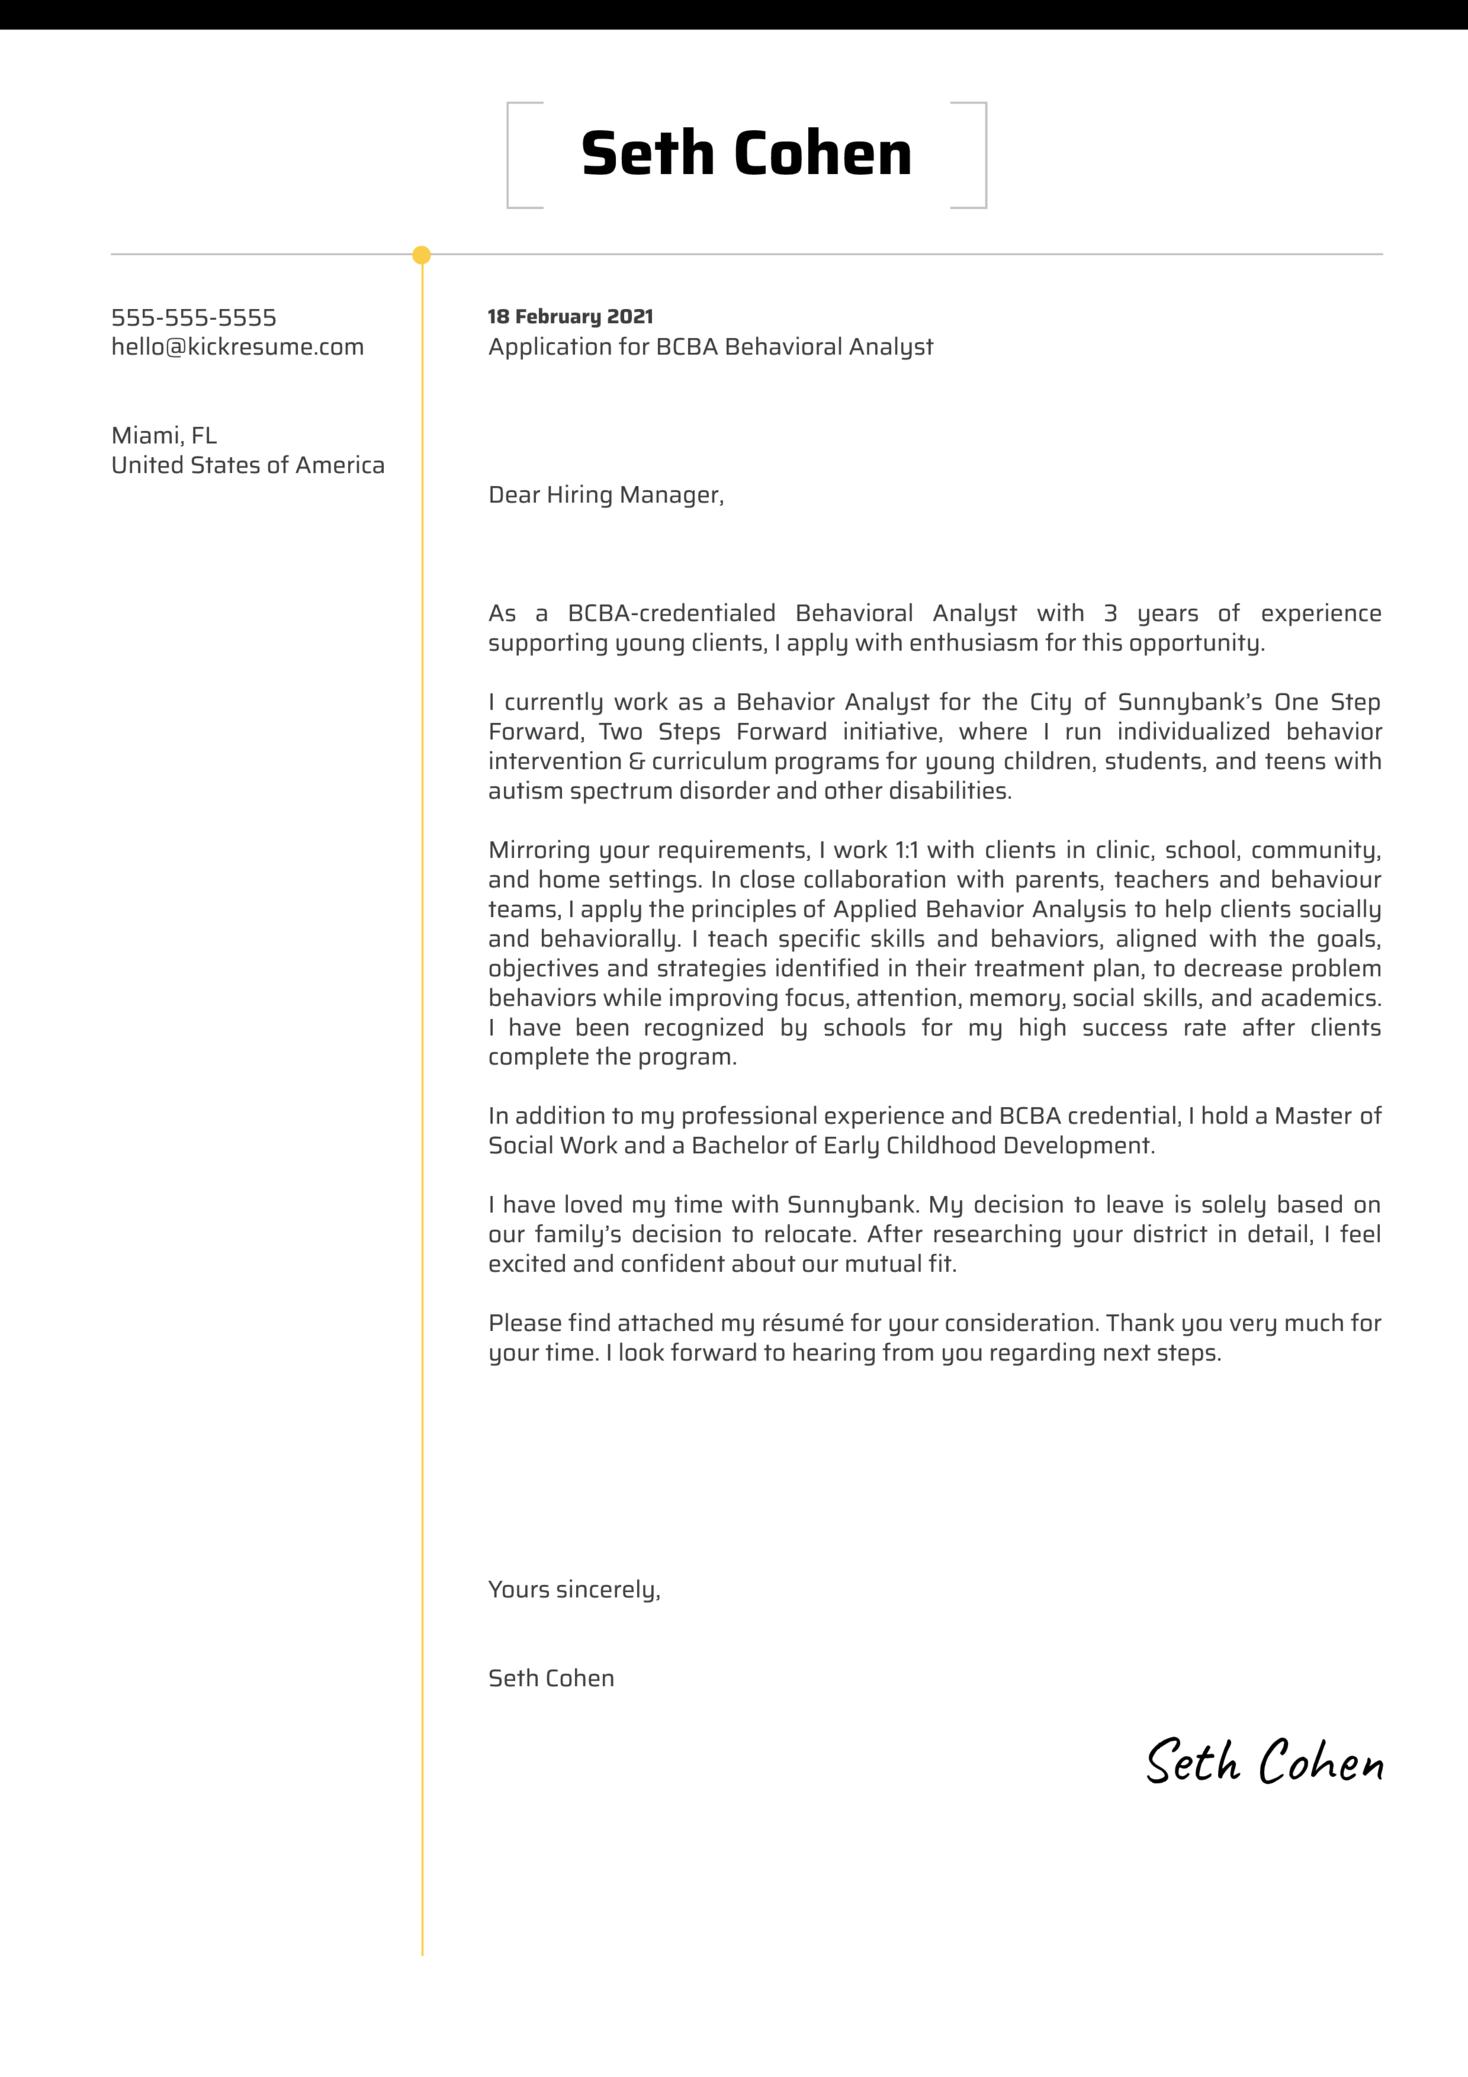 BCBA Behavioral Analyst Cover Letter Template